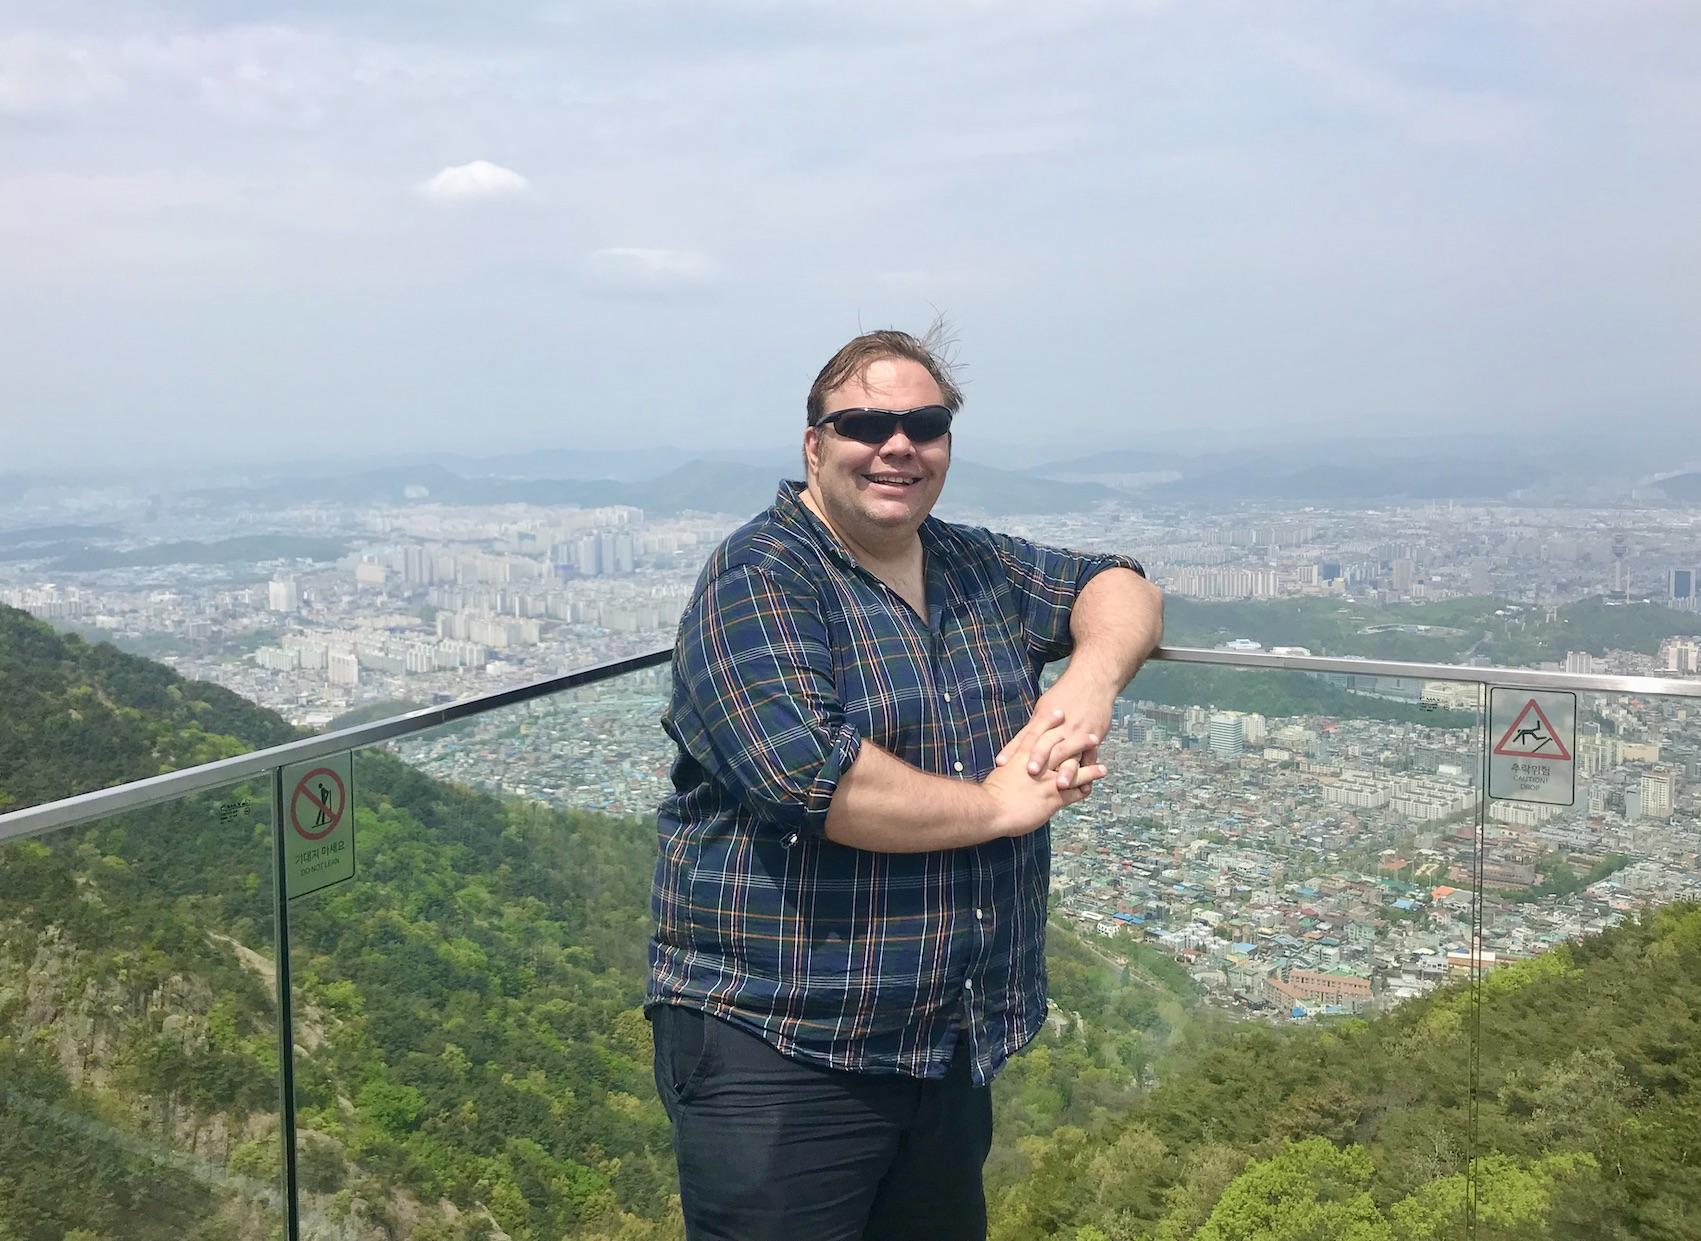 Apsan Mountain in South Korea.